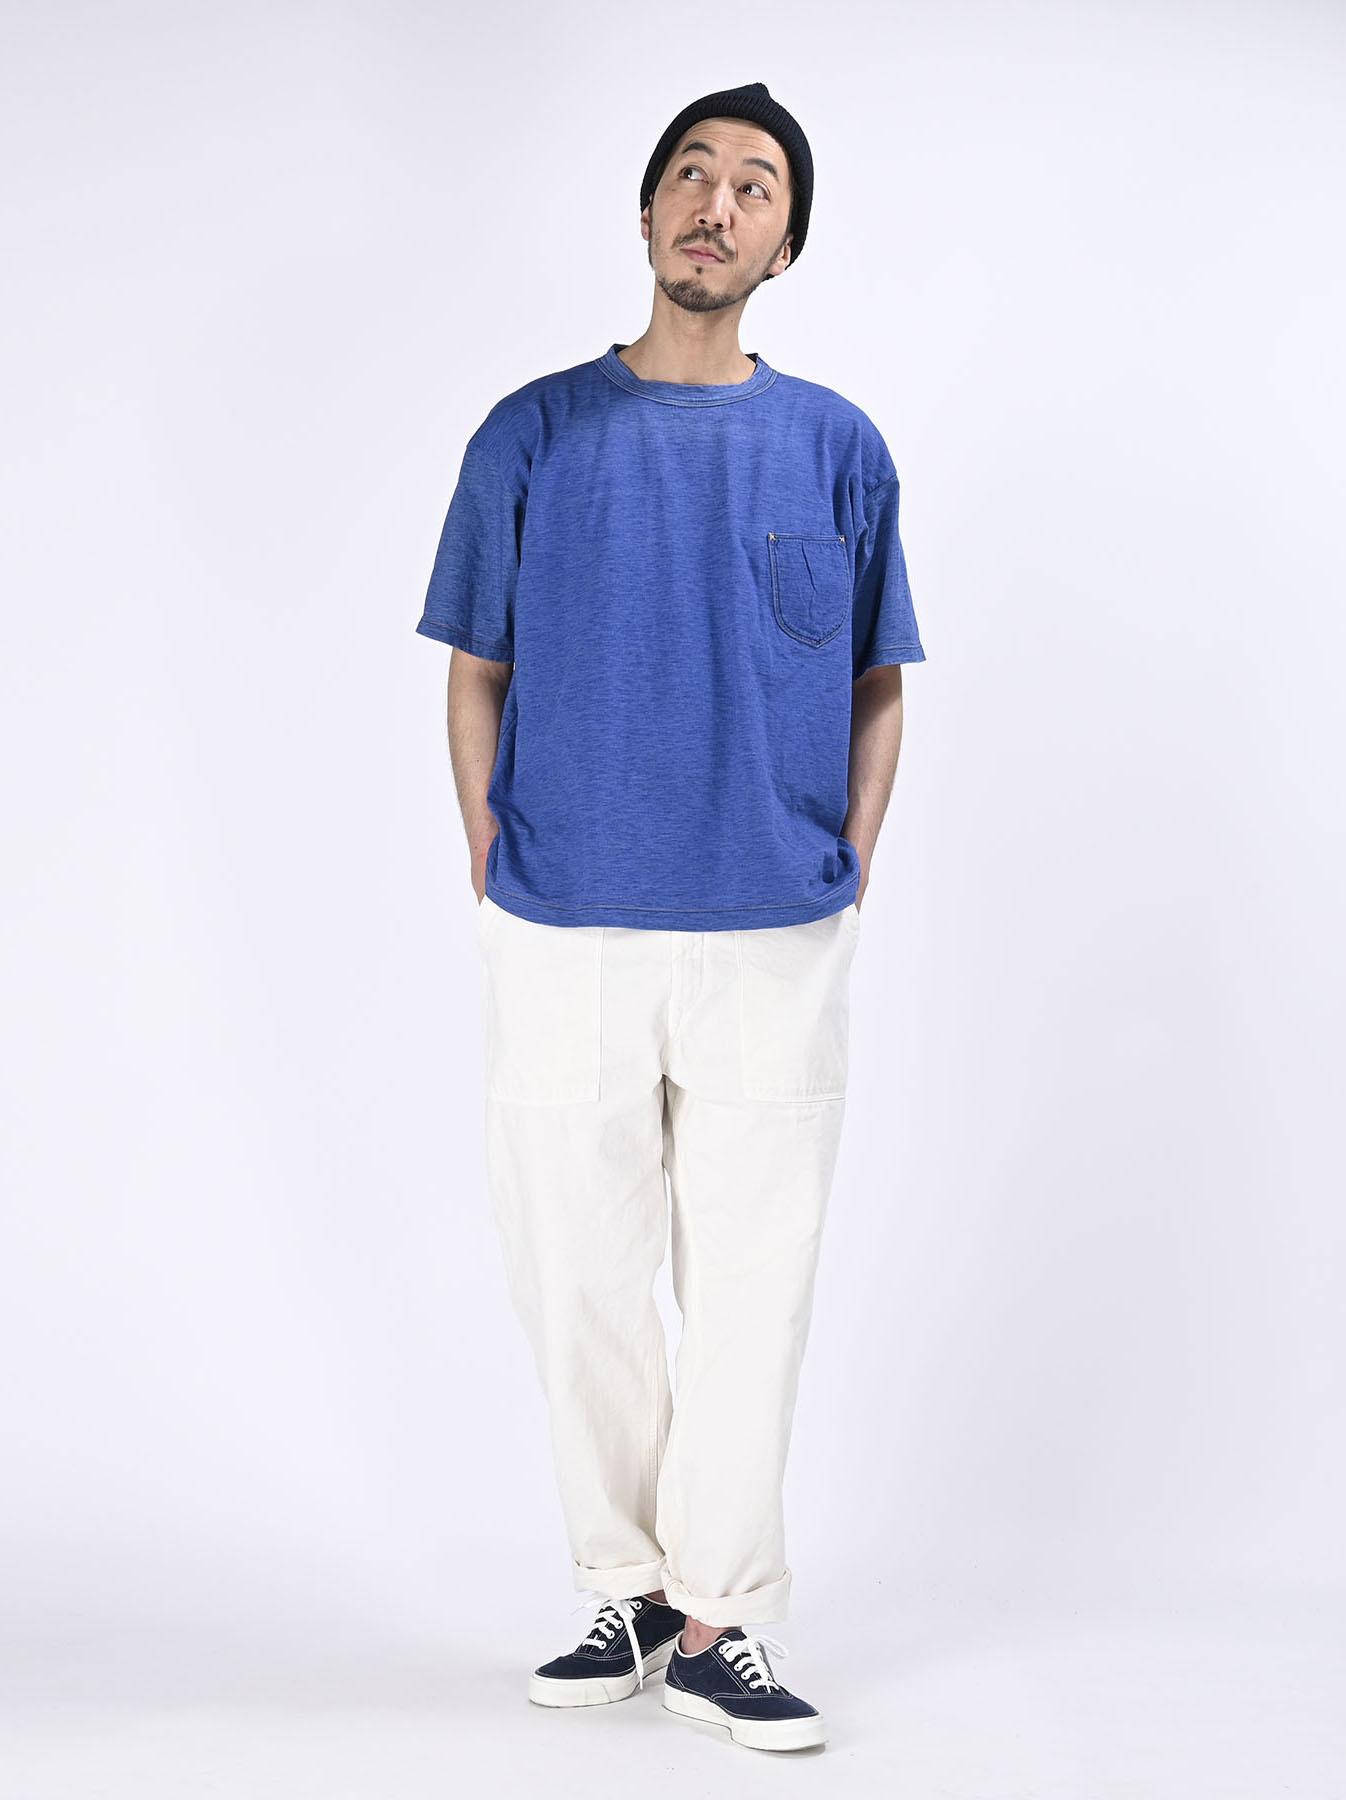 Distressed Indigo Tenjiku 908 Ocean T-Shirt (0621)-2